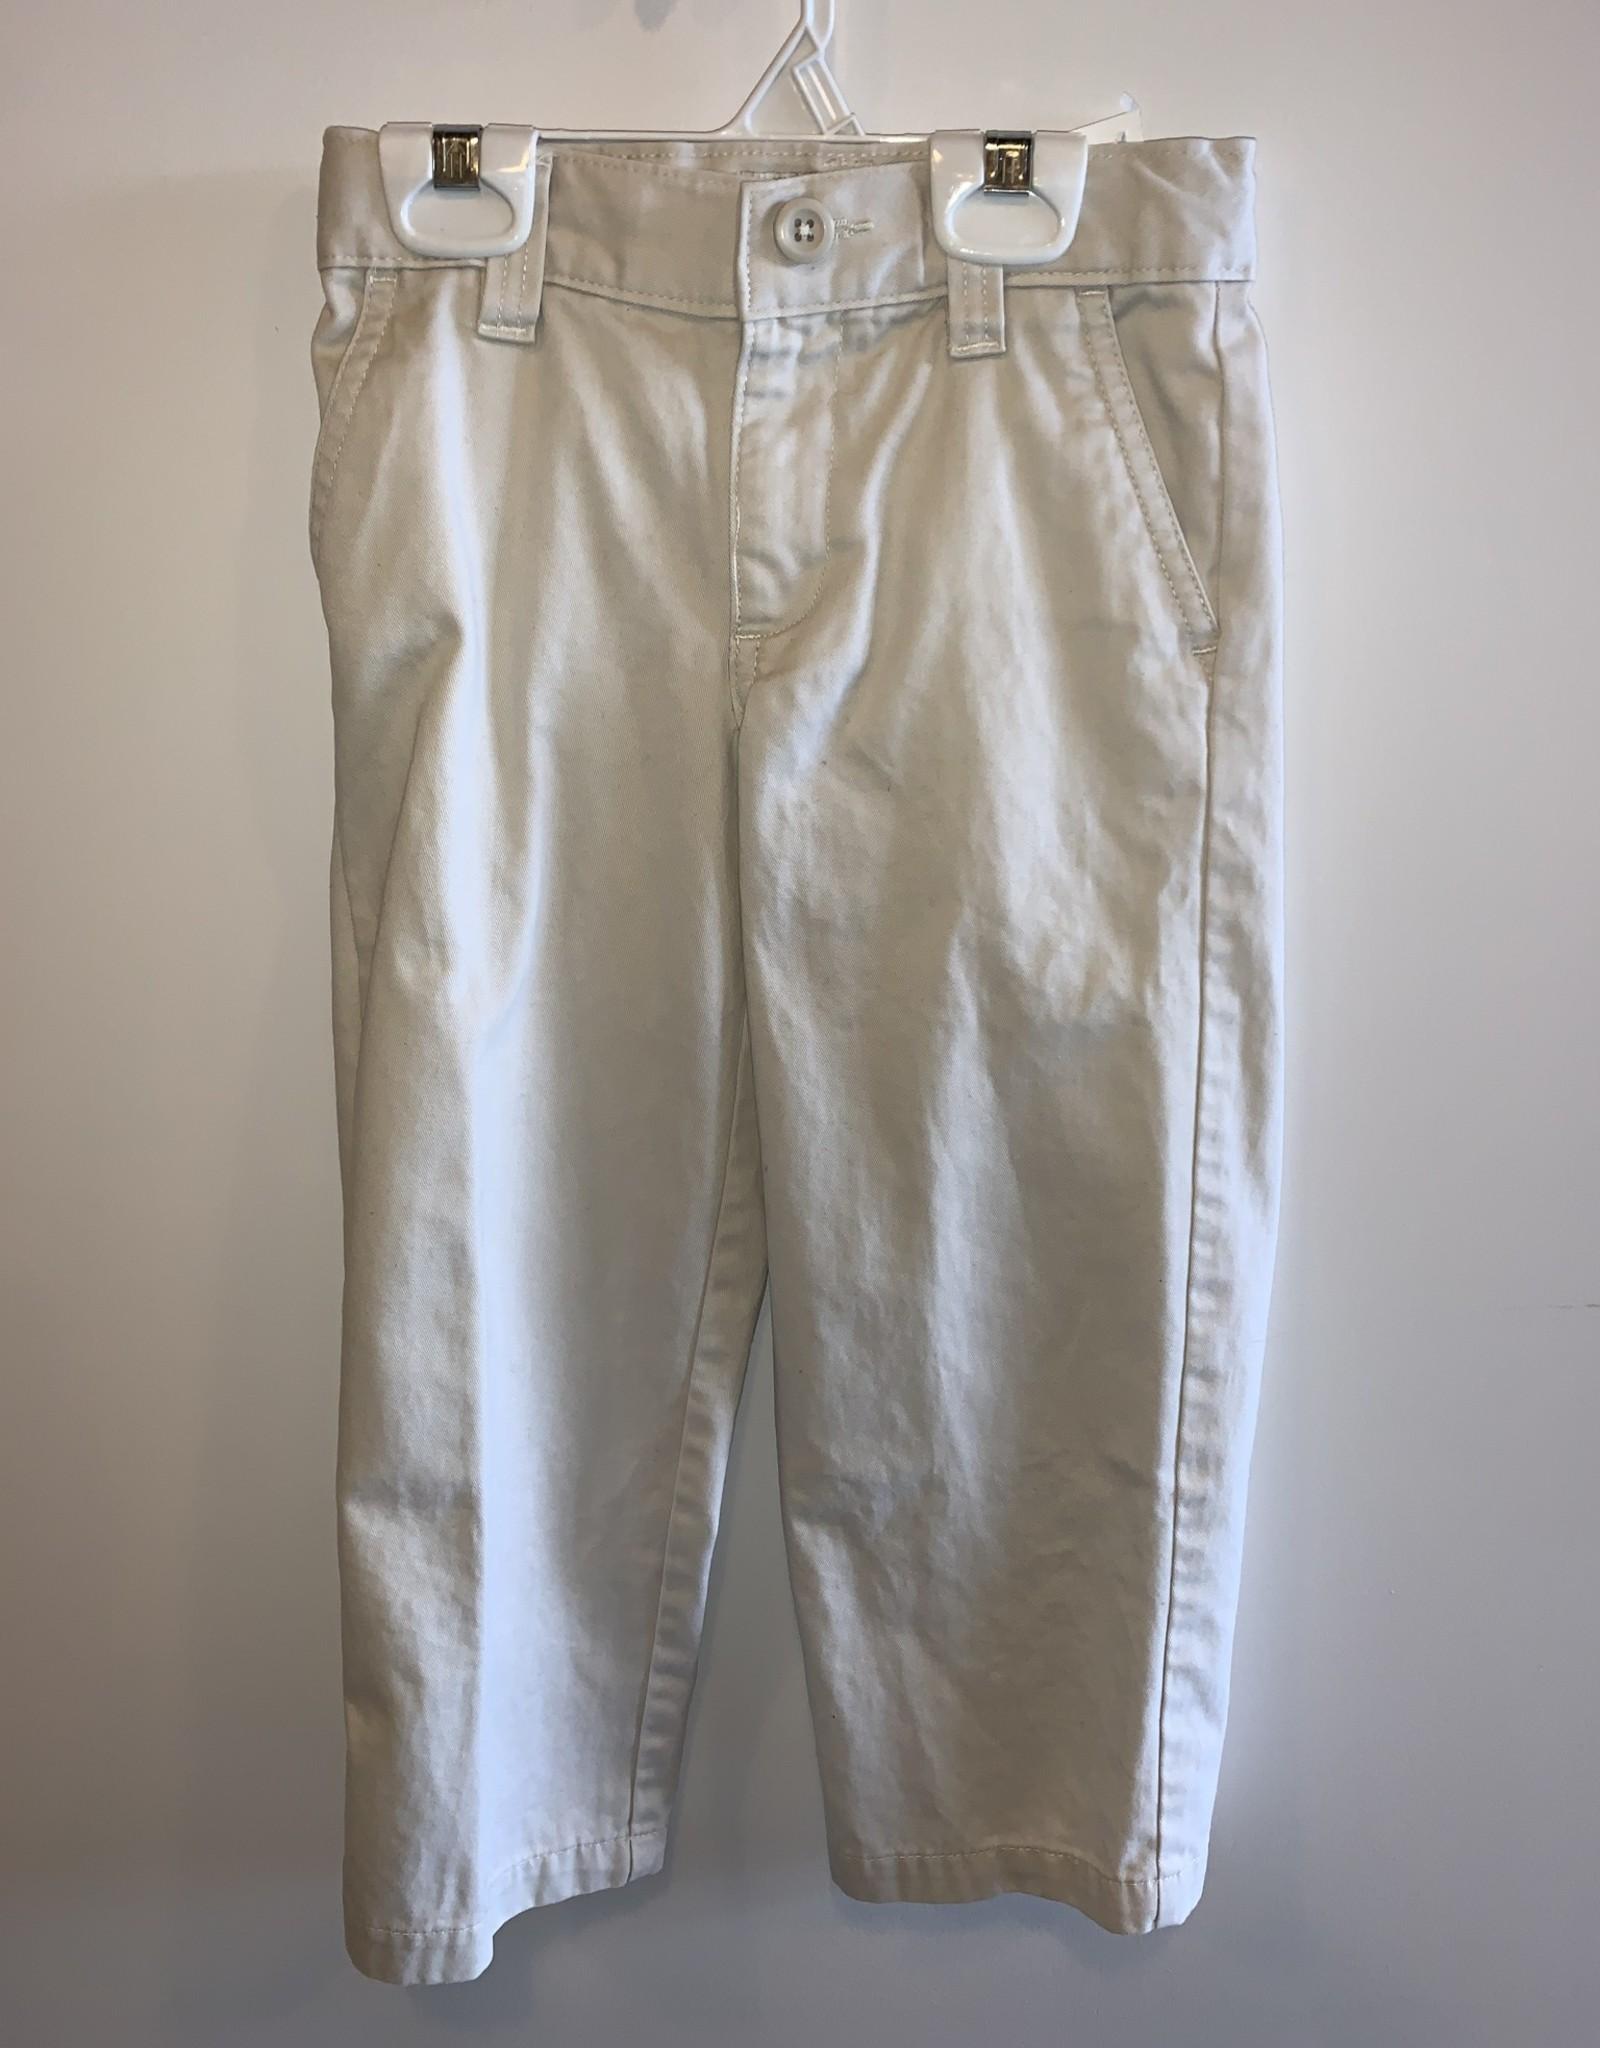 Osh Kosh Boys/5T/OshKosh/Pants